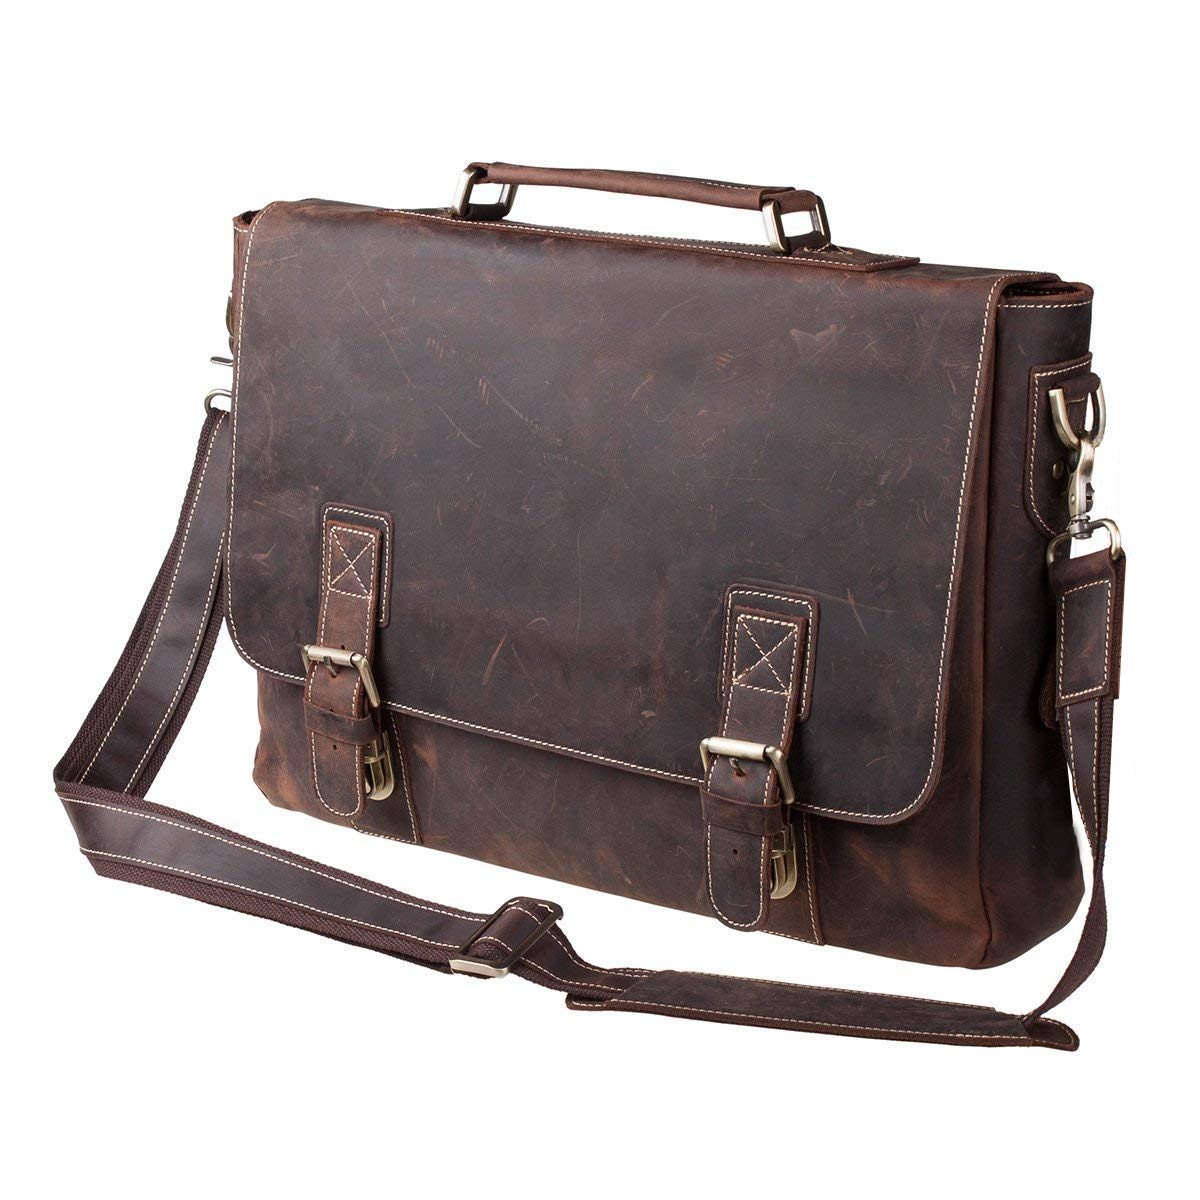 S-ZONE Vintage Leather Briefcase 15.6 Inch Laptop Messenger Shoulder Satchel Bag by S-ZONE